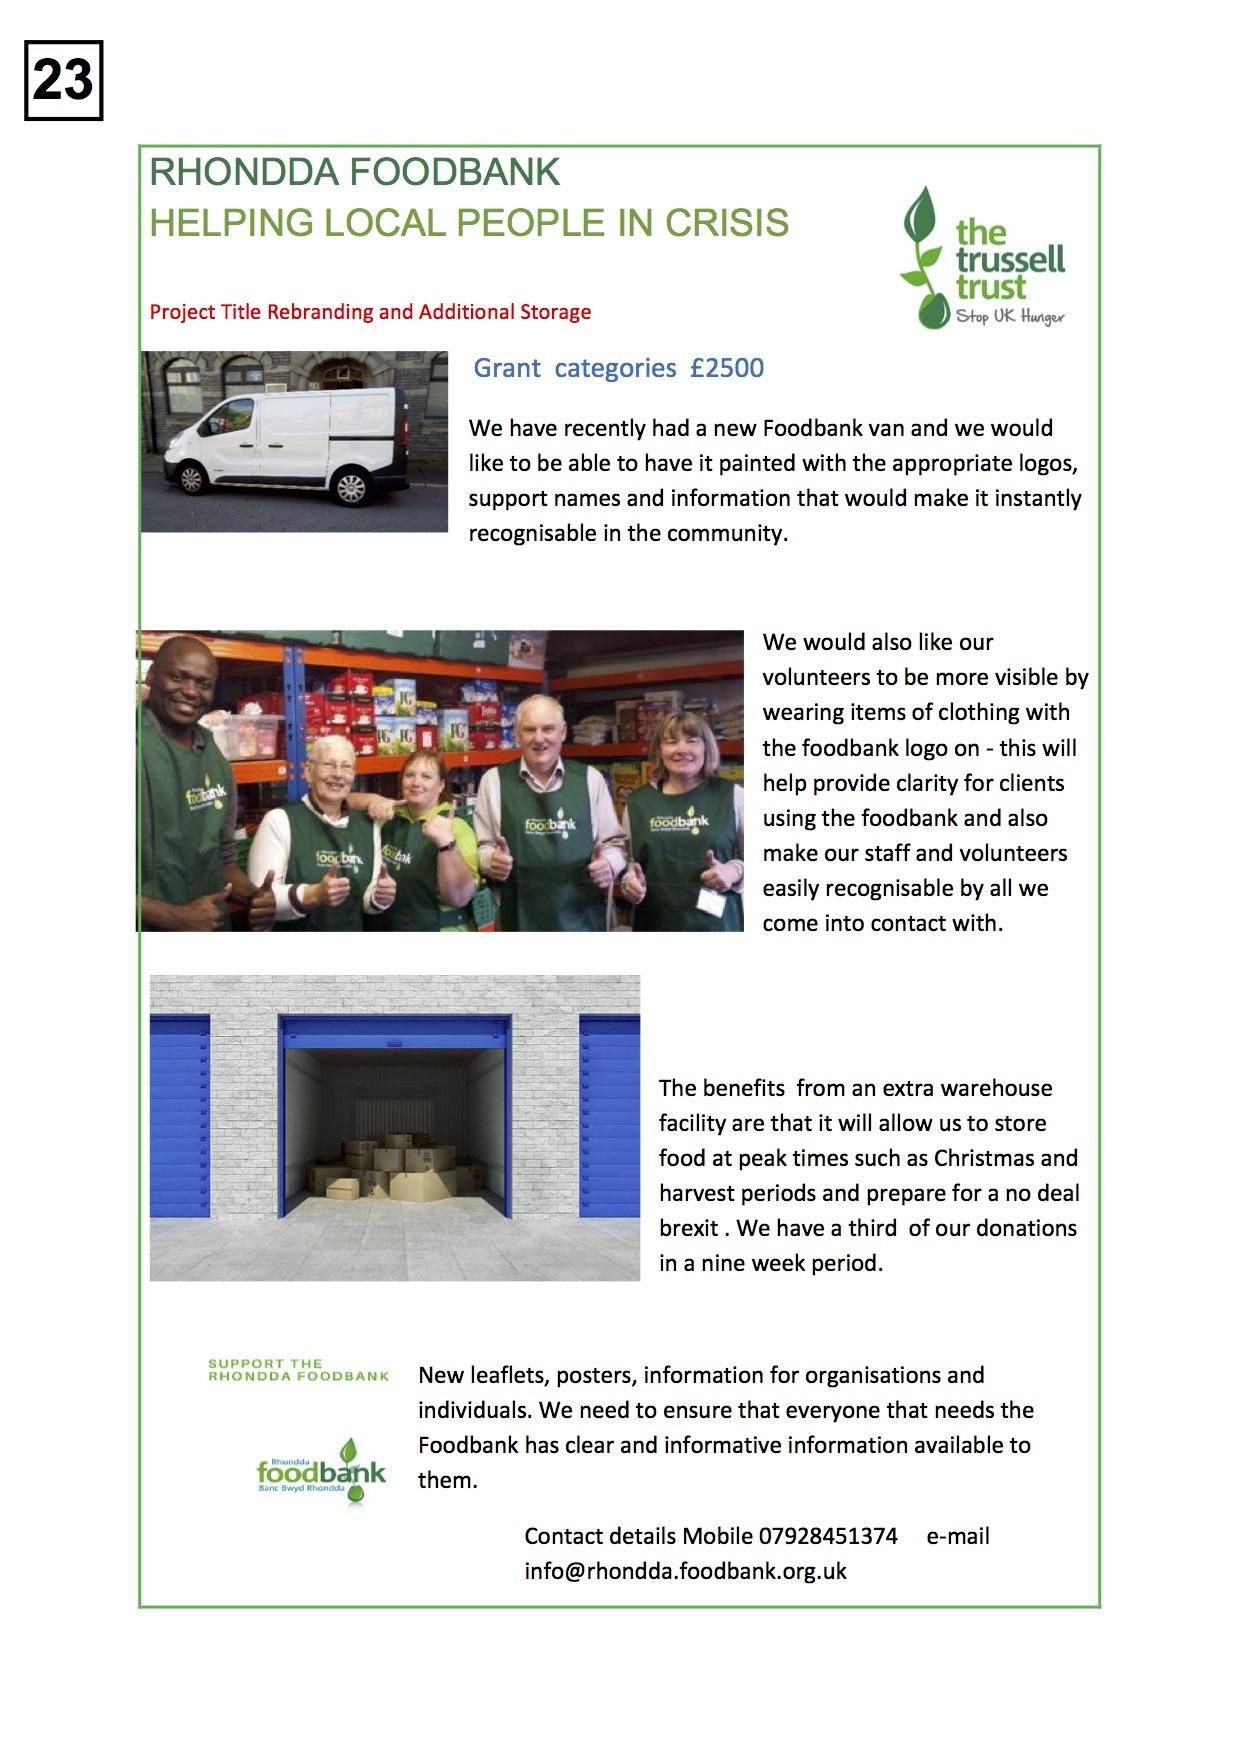 23. Rhondda Foodbank - Poster - 270919